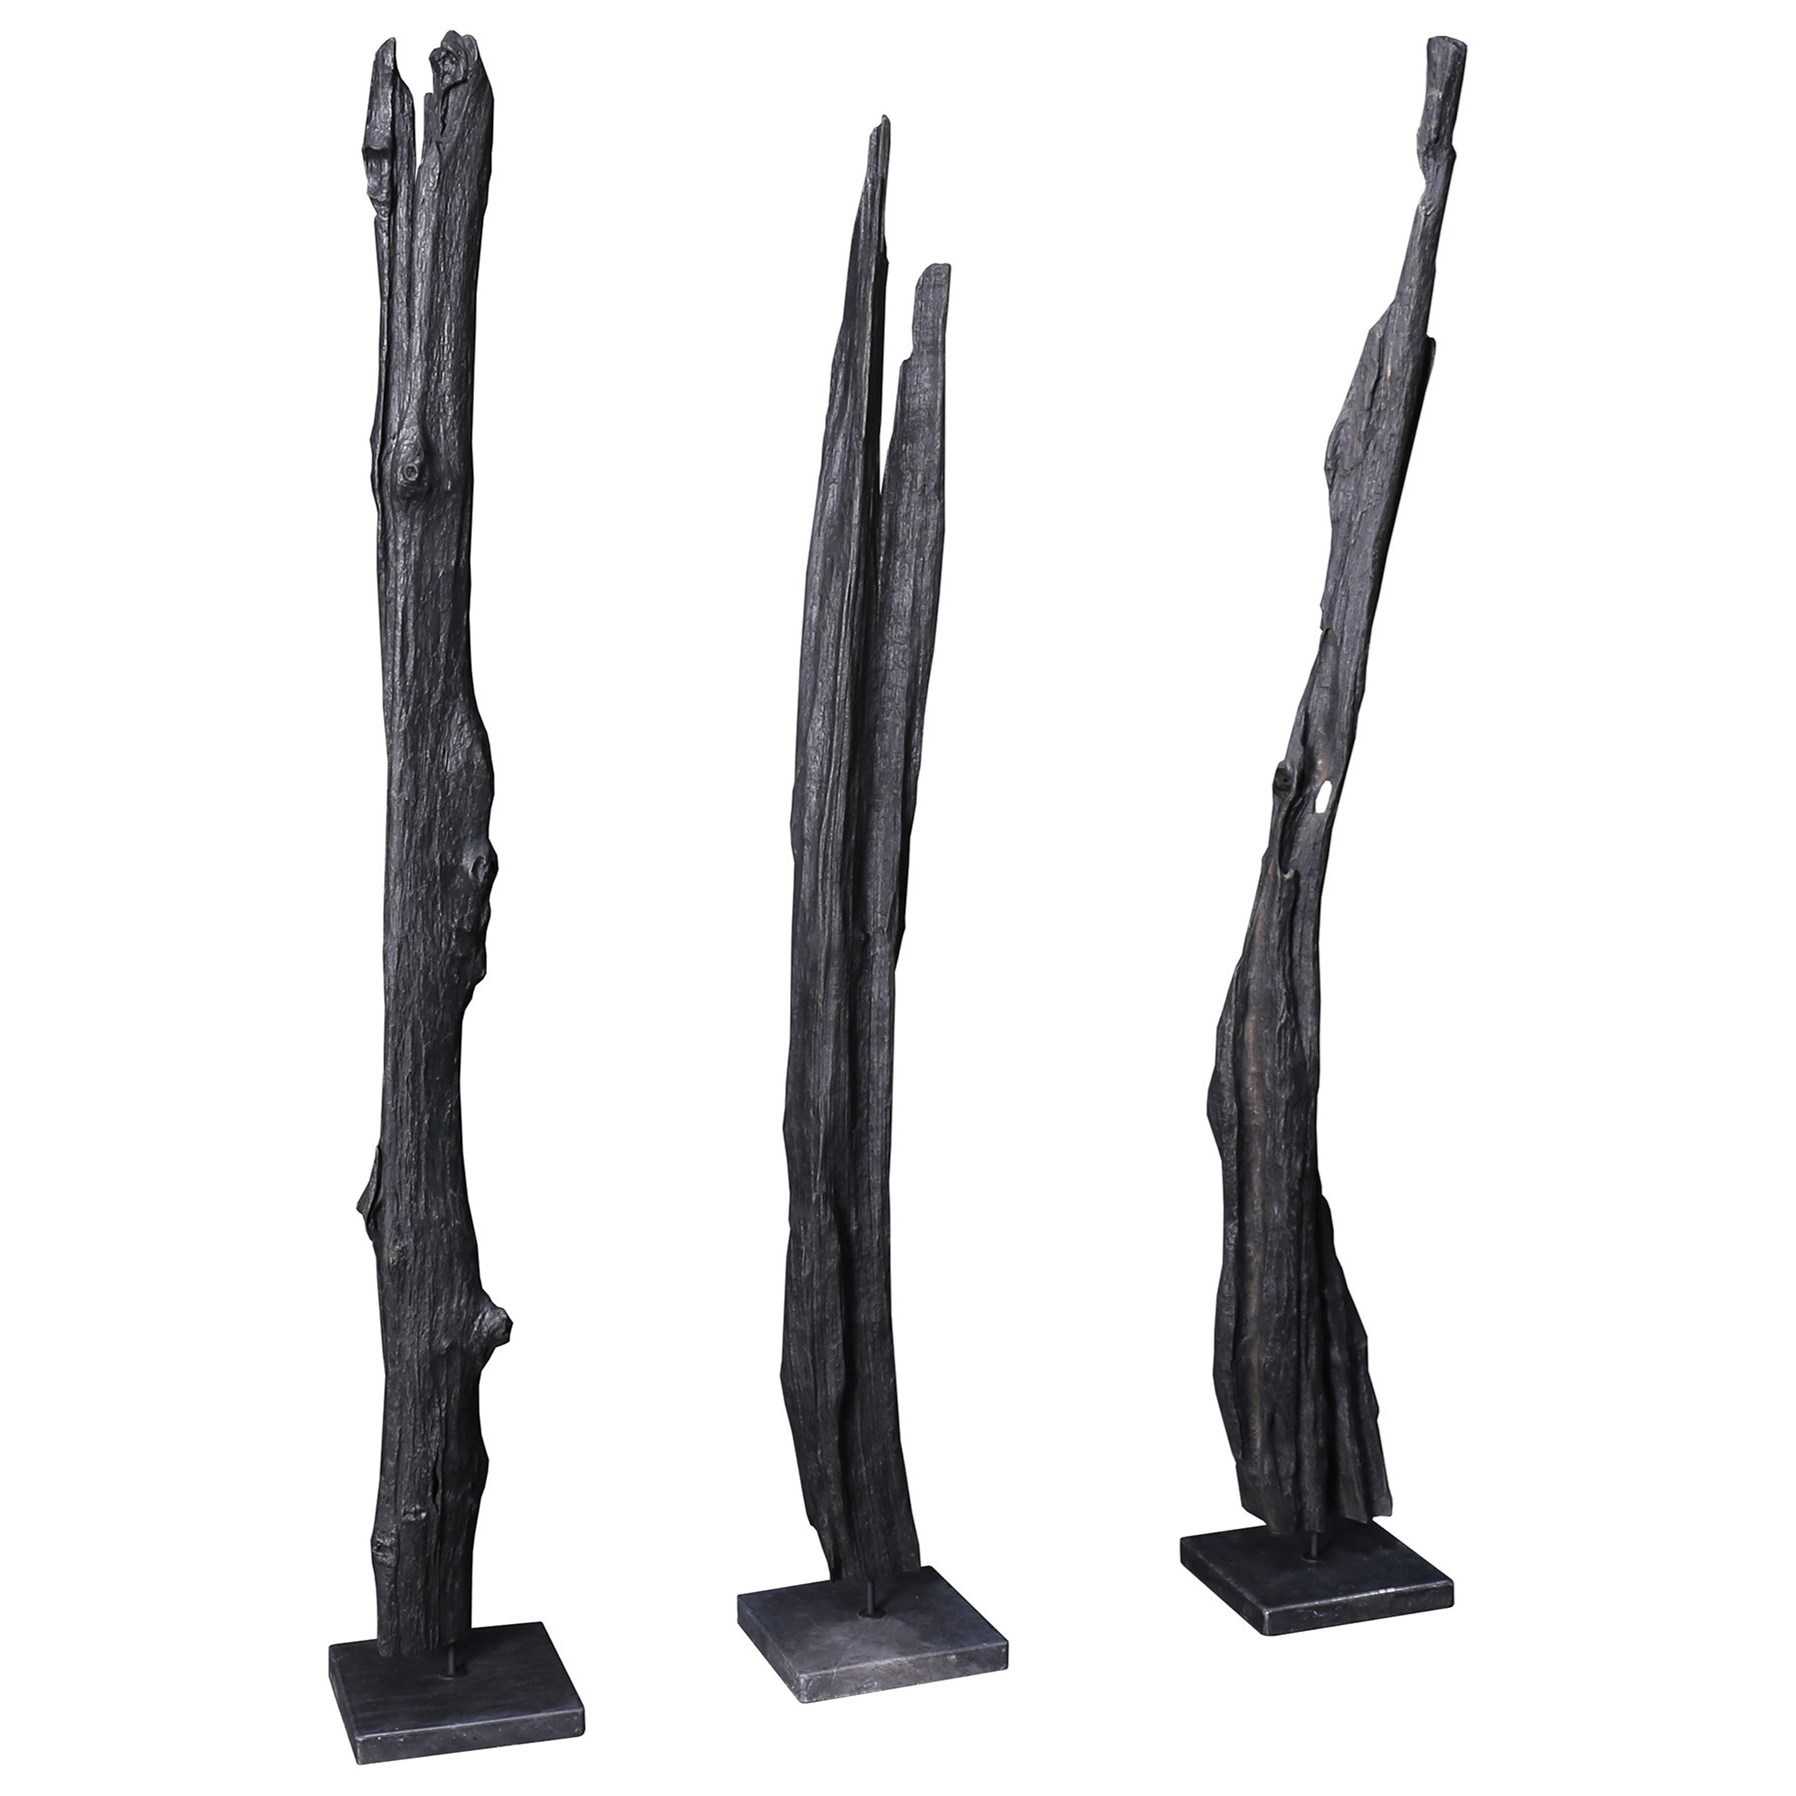 Moe S Home Collection Sculptures Tall Teak Wood Sculpture Weathered Grey Wilson S Furniture Sculptures Figurines